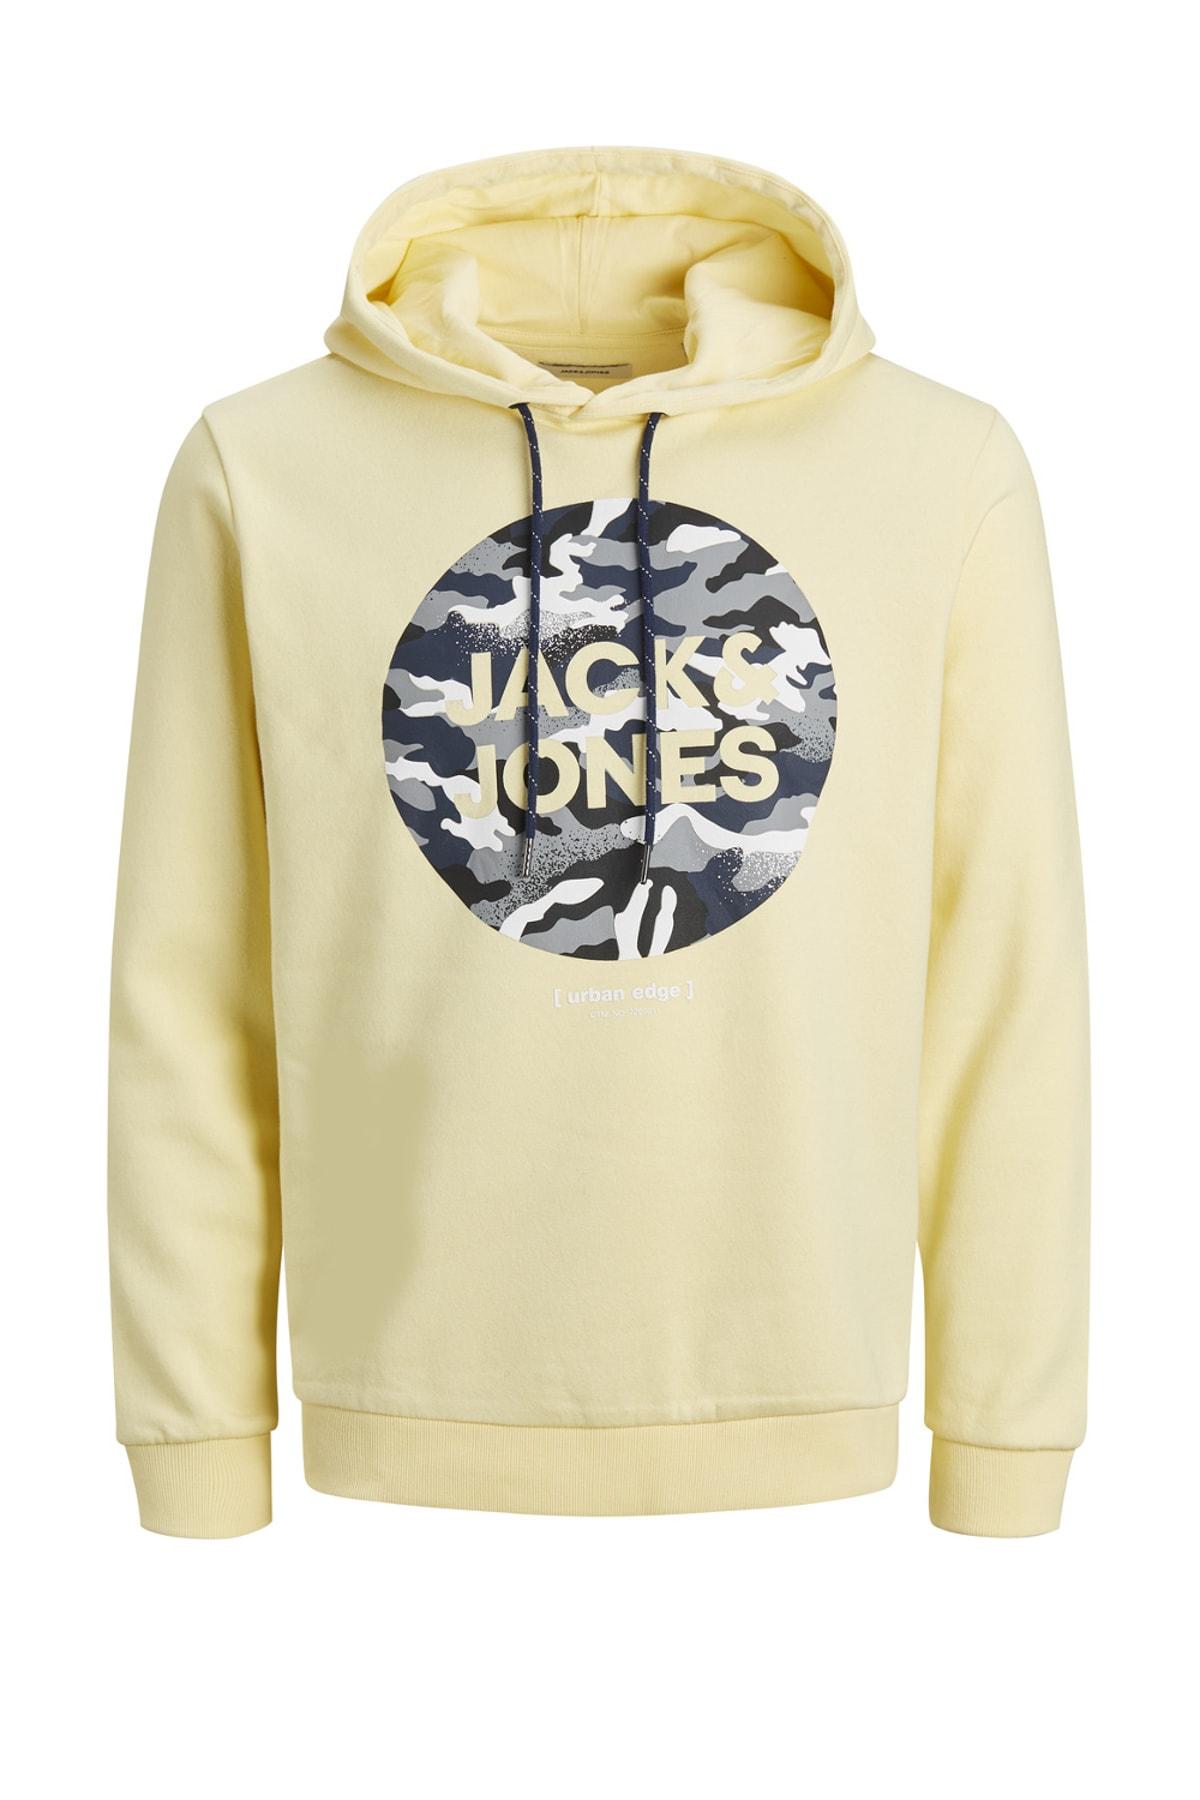 Jack & Jones Kapüşonlu Sweatshirt 12184710 JJPRIME 1